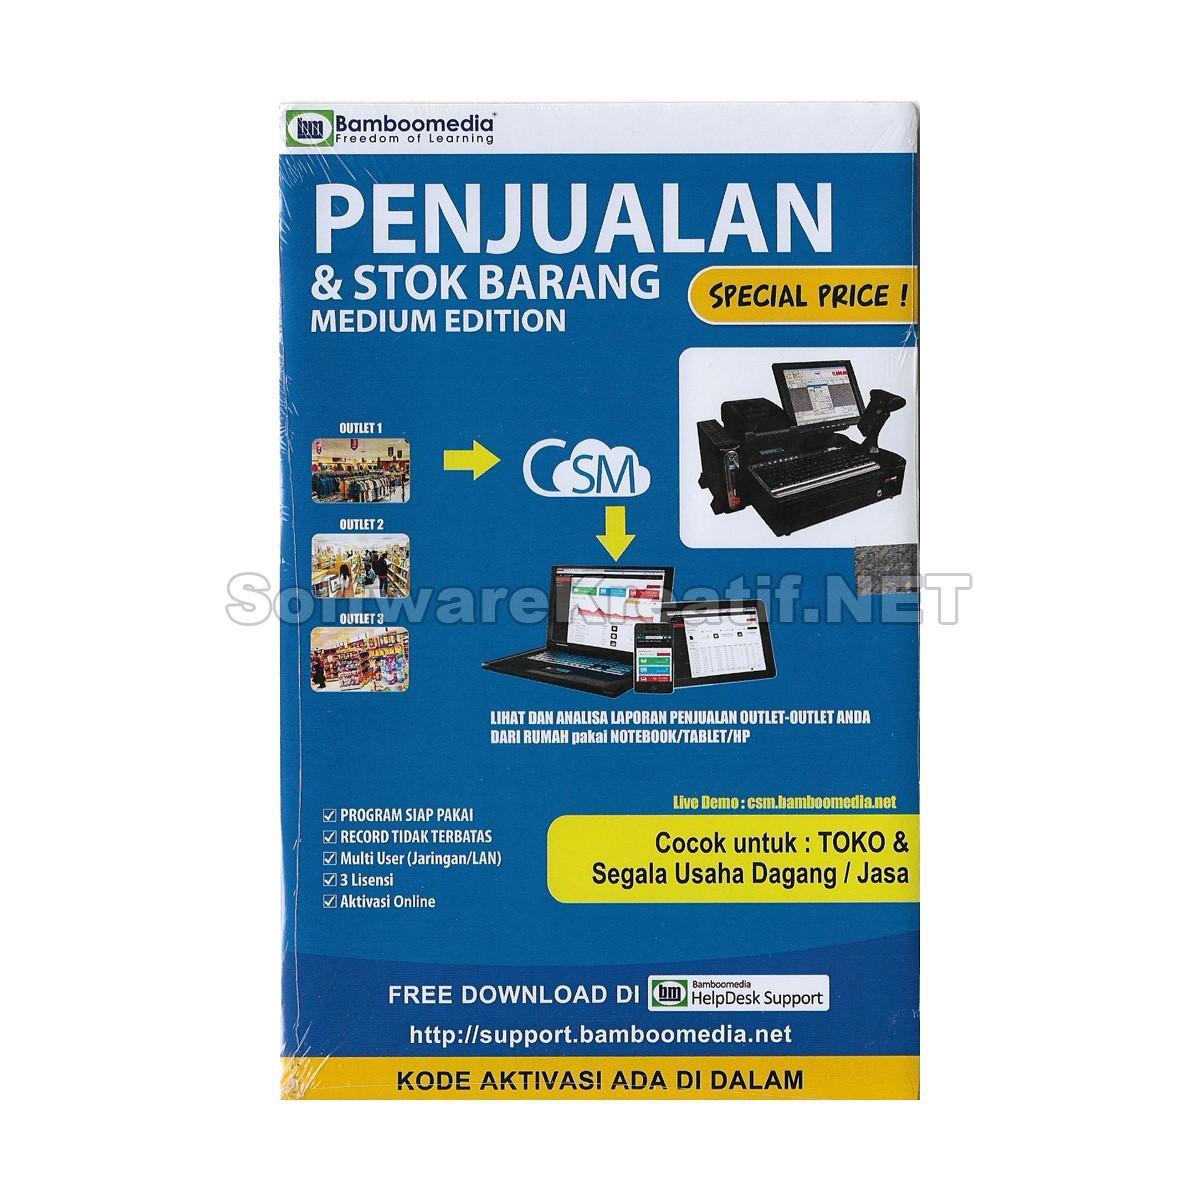 Software Office Original Terbaru Lisensi Proffesional Plus 2016 Bamboomedia Program Penjualan Dan Stok Barang Medium Edition